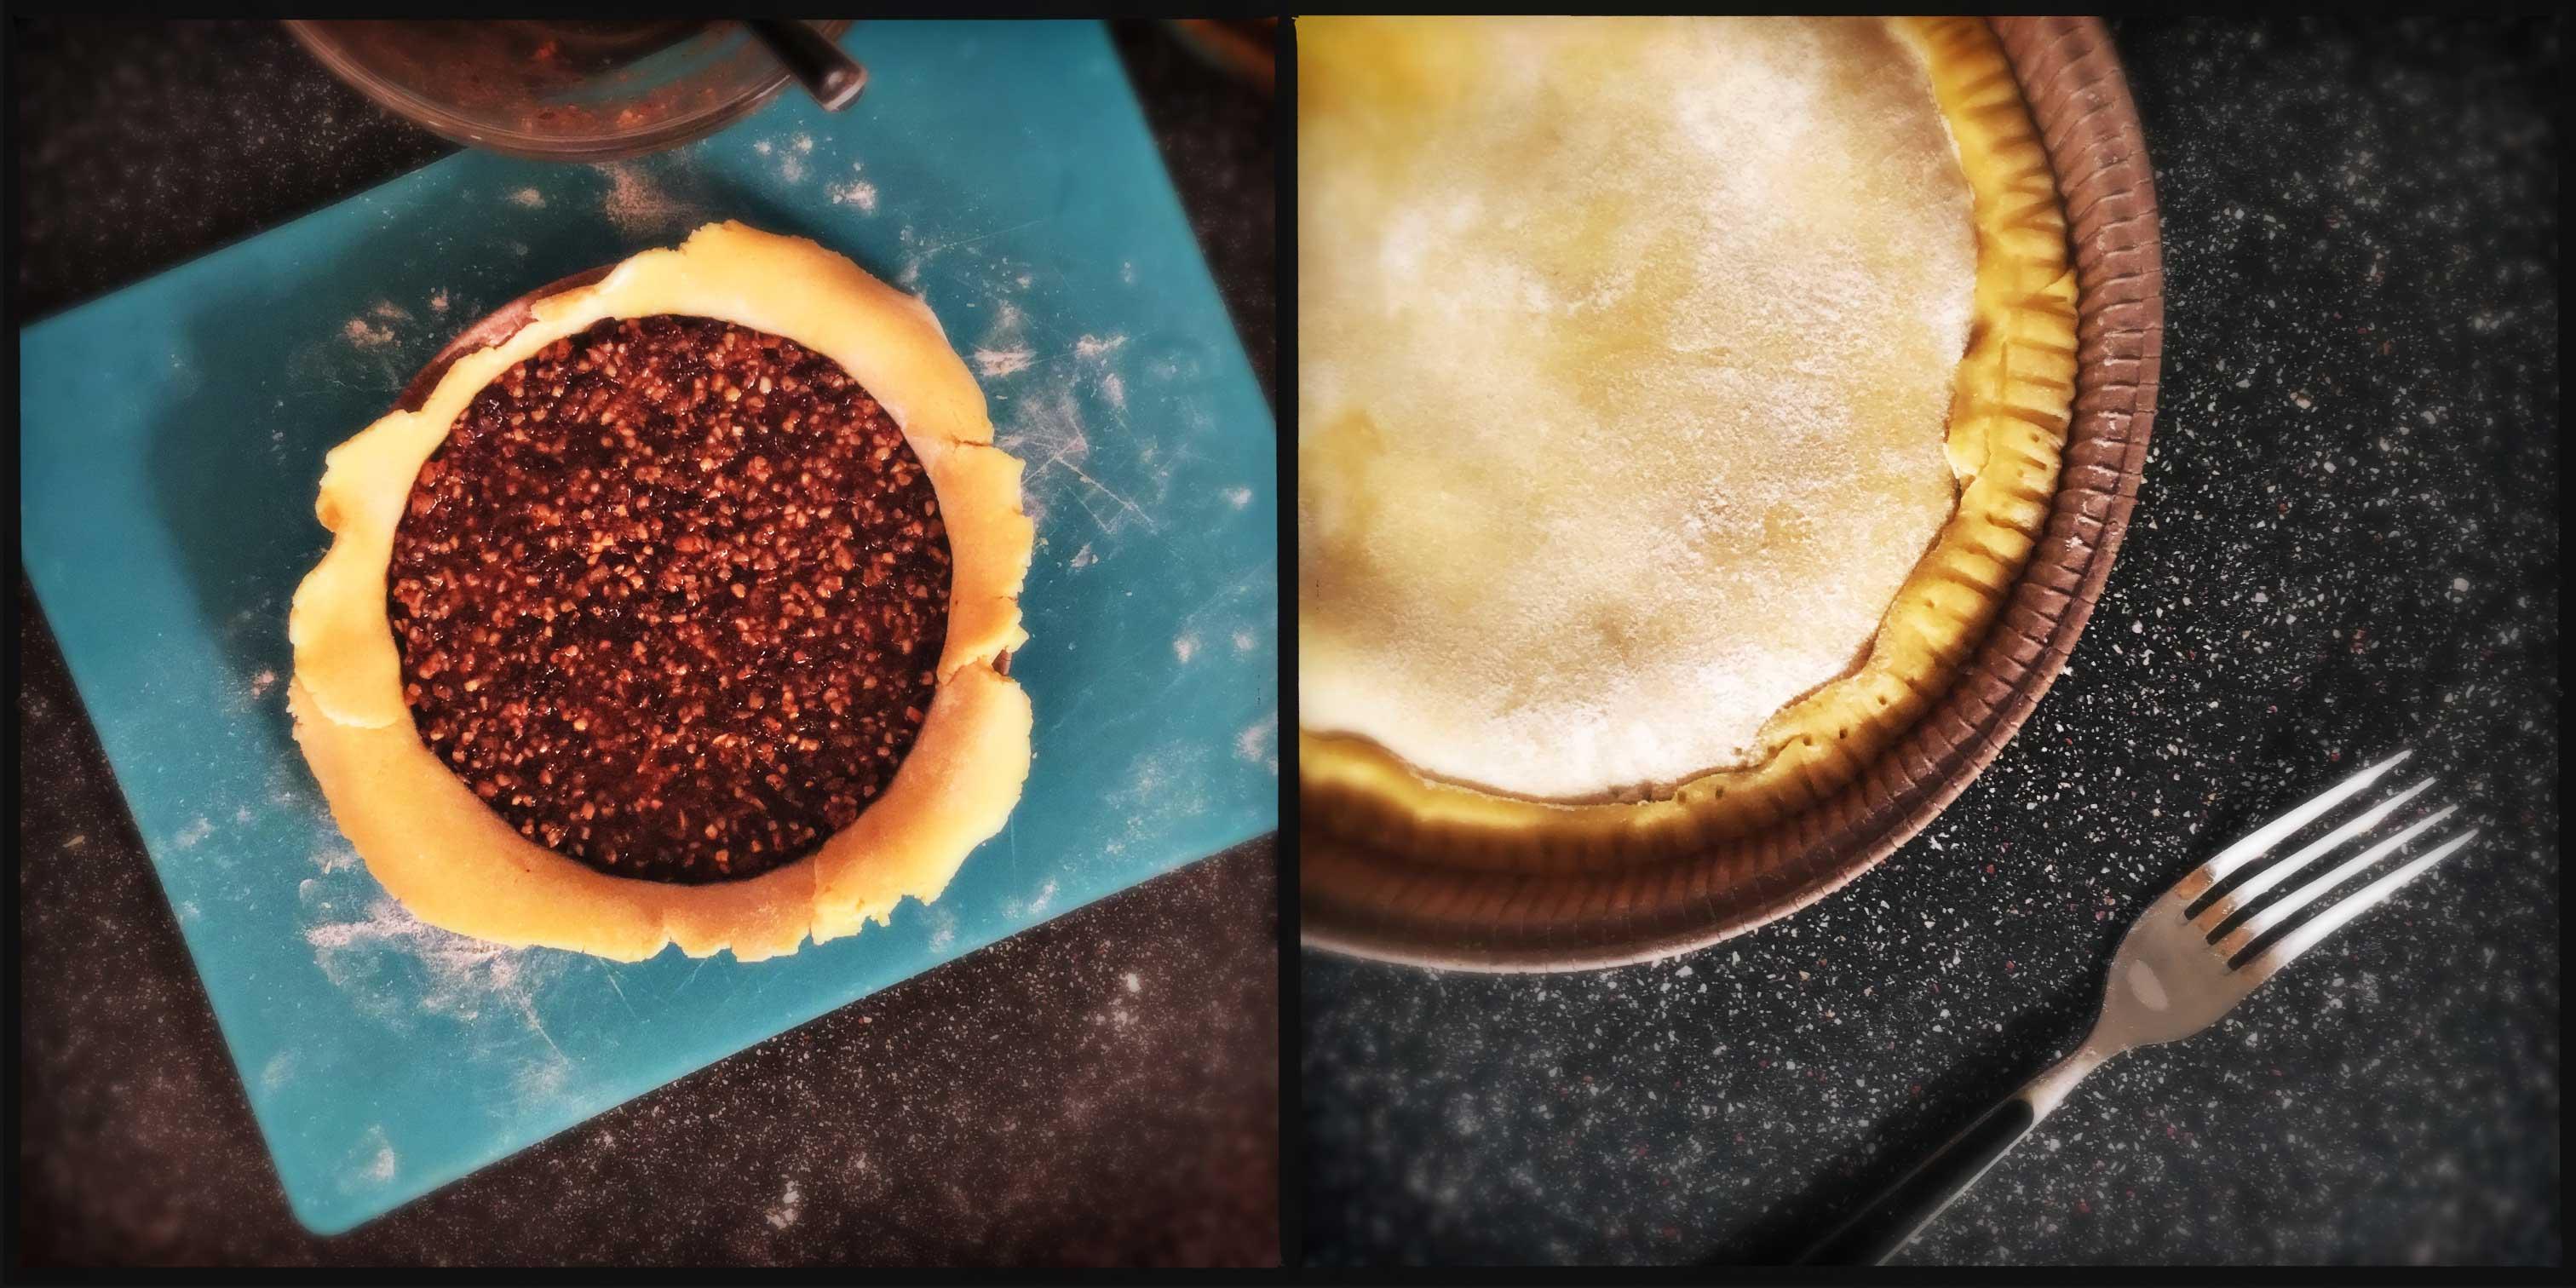 torta rossa di langhirano